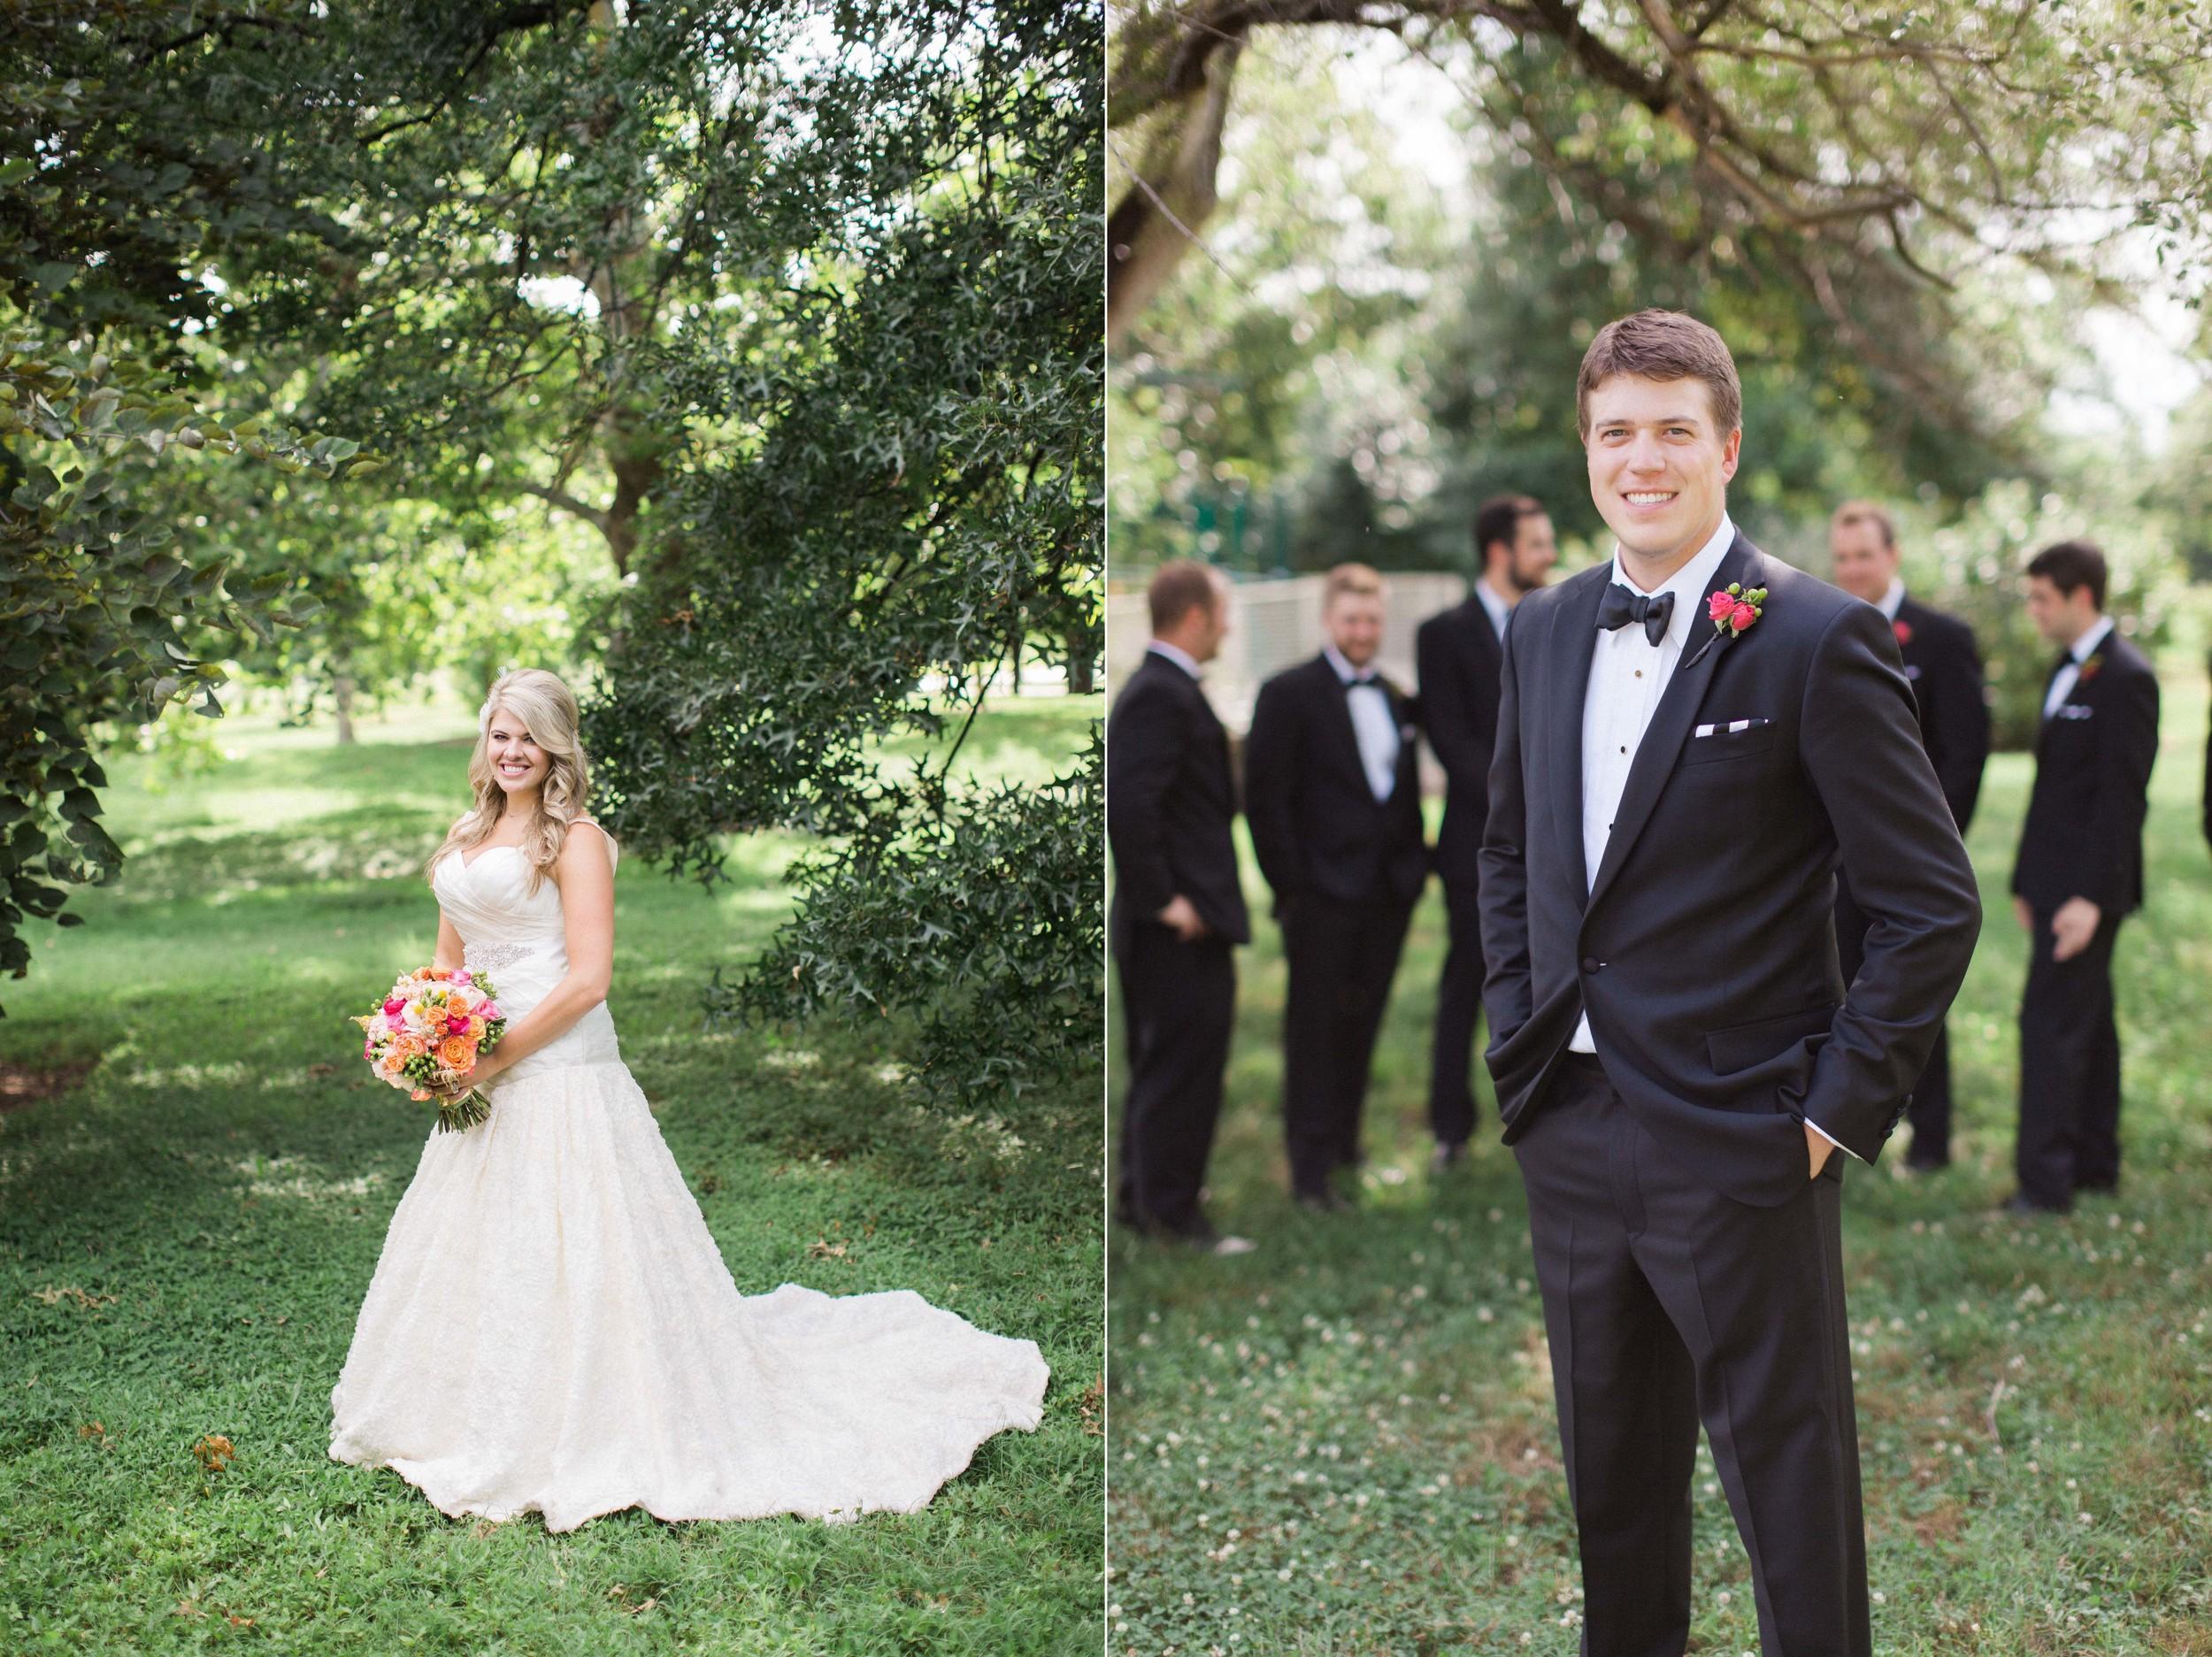 Chase Park Plaza St Louis Wedding Photo-1055 copy.jpg